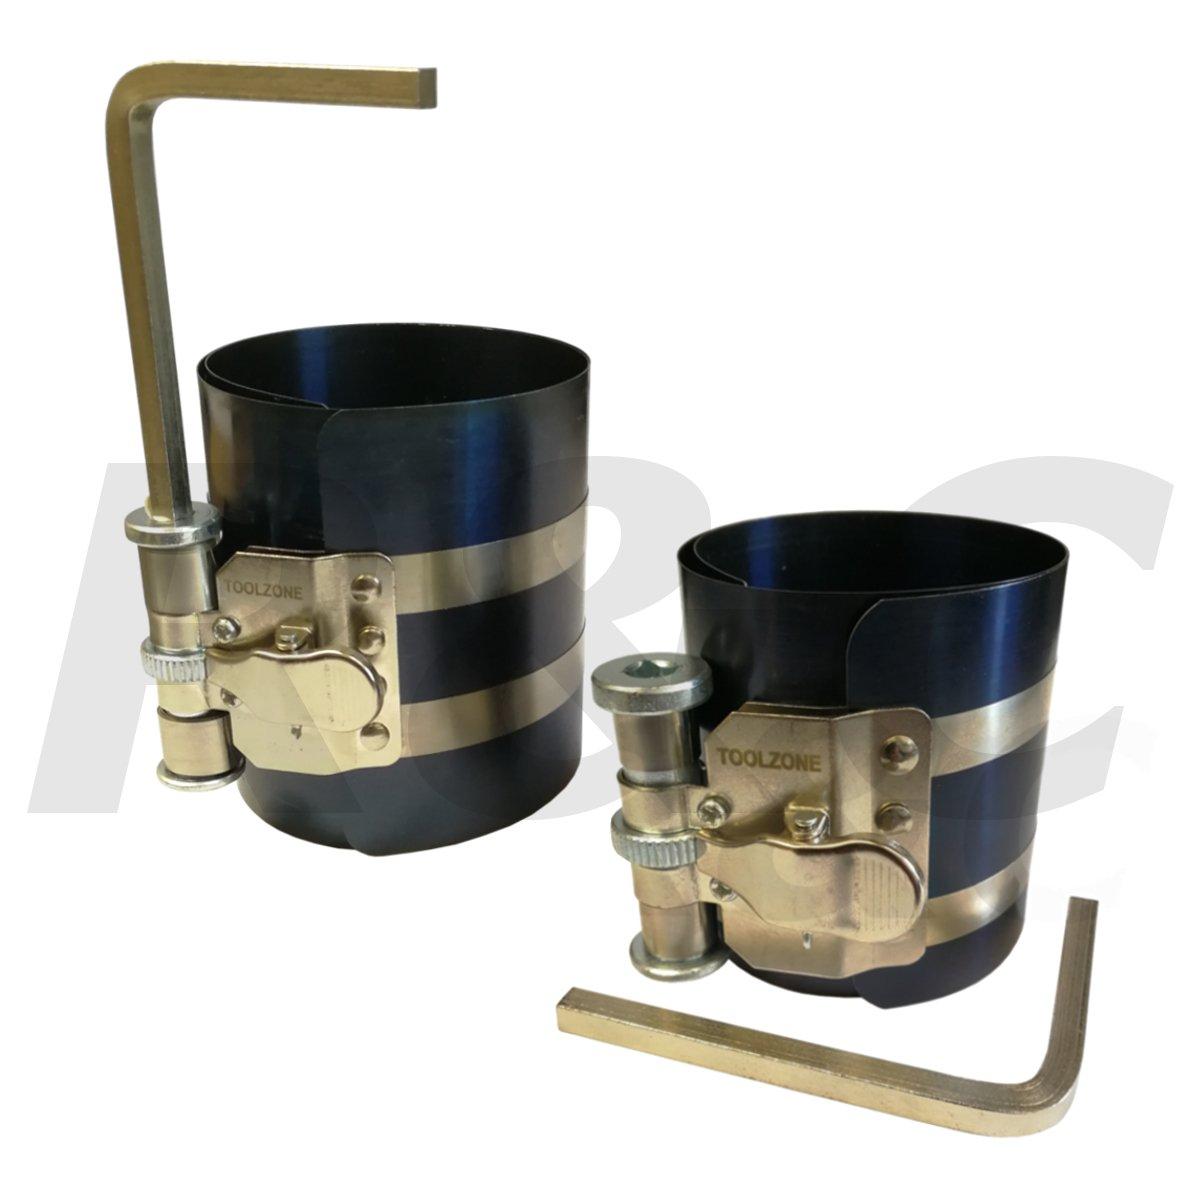 TZ 2Pc Piston Ring Compressor Set Small 50-125mm & Large 75-17mm Ratchet Type